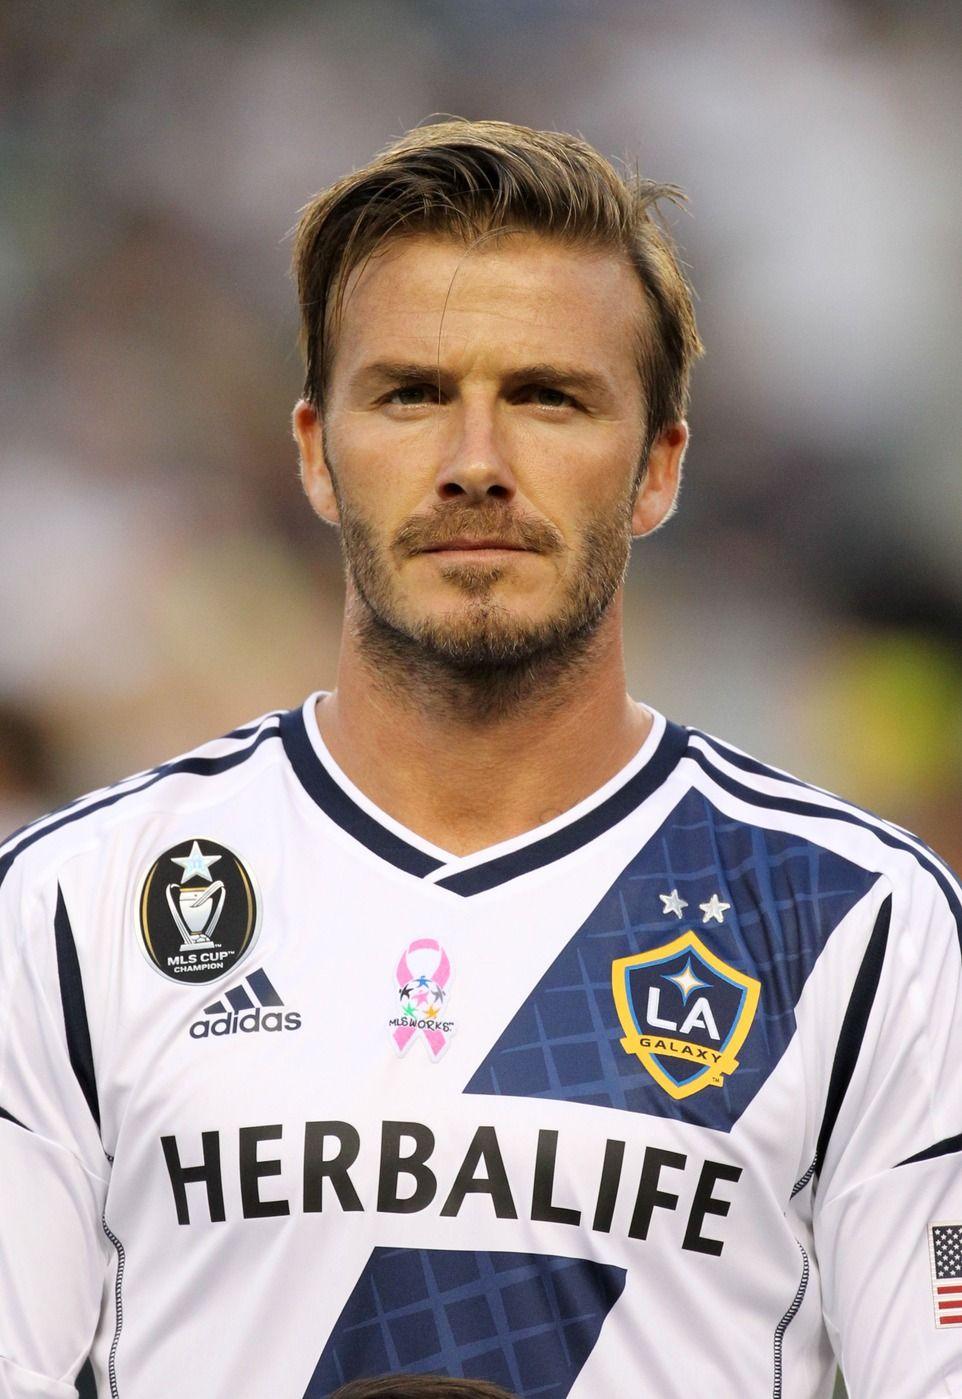 david beckham playing soccer - Google Search  7b49f0d7f